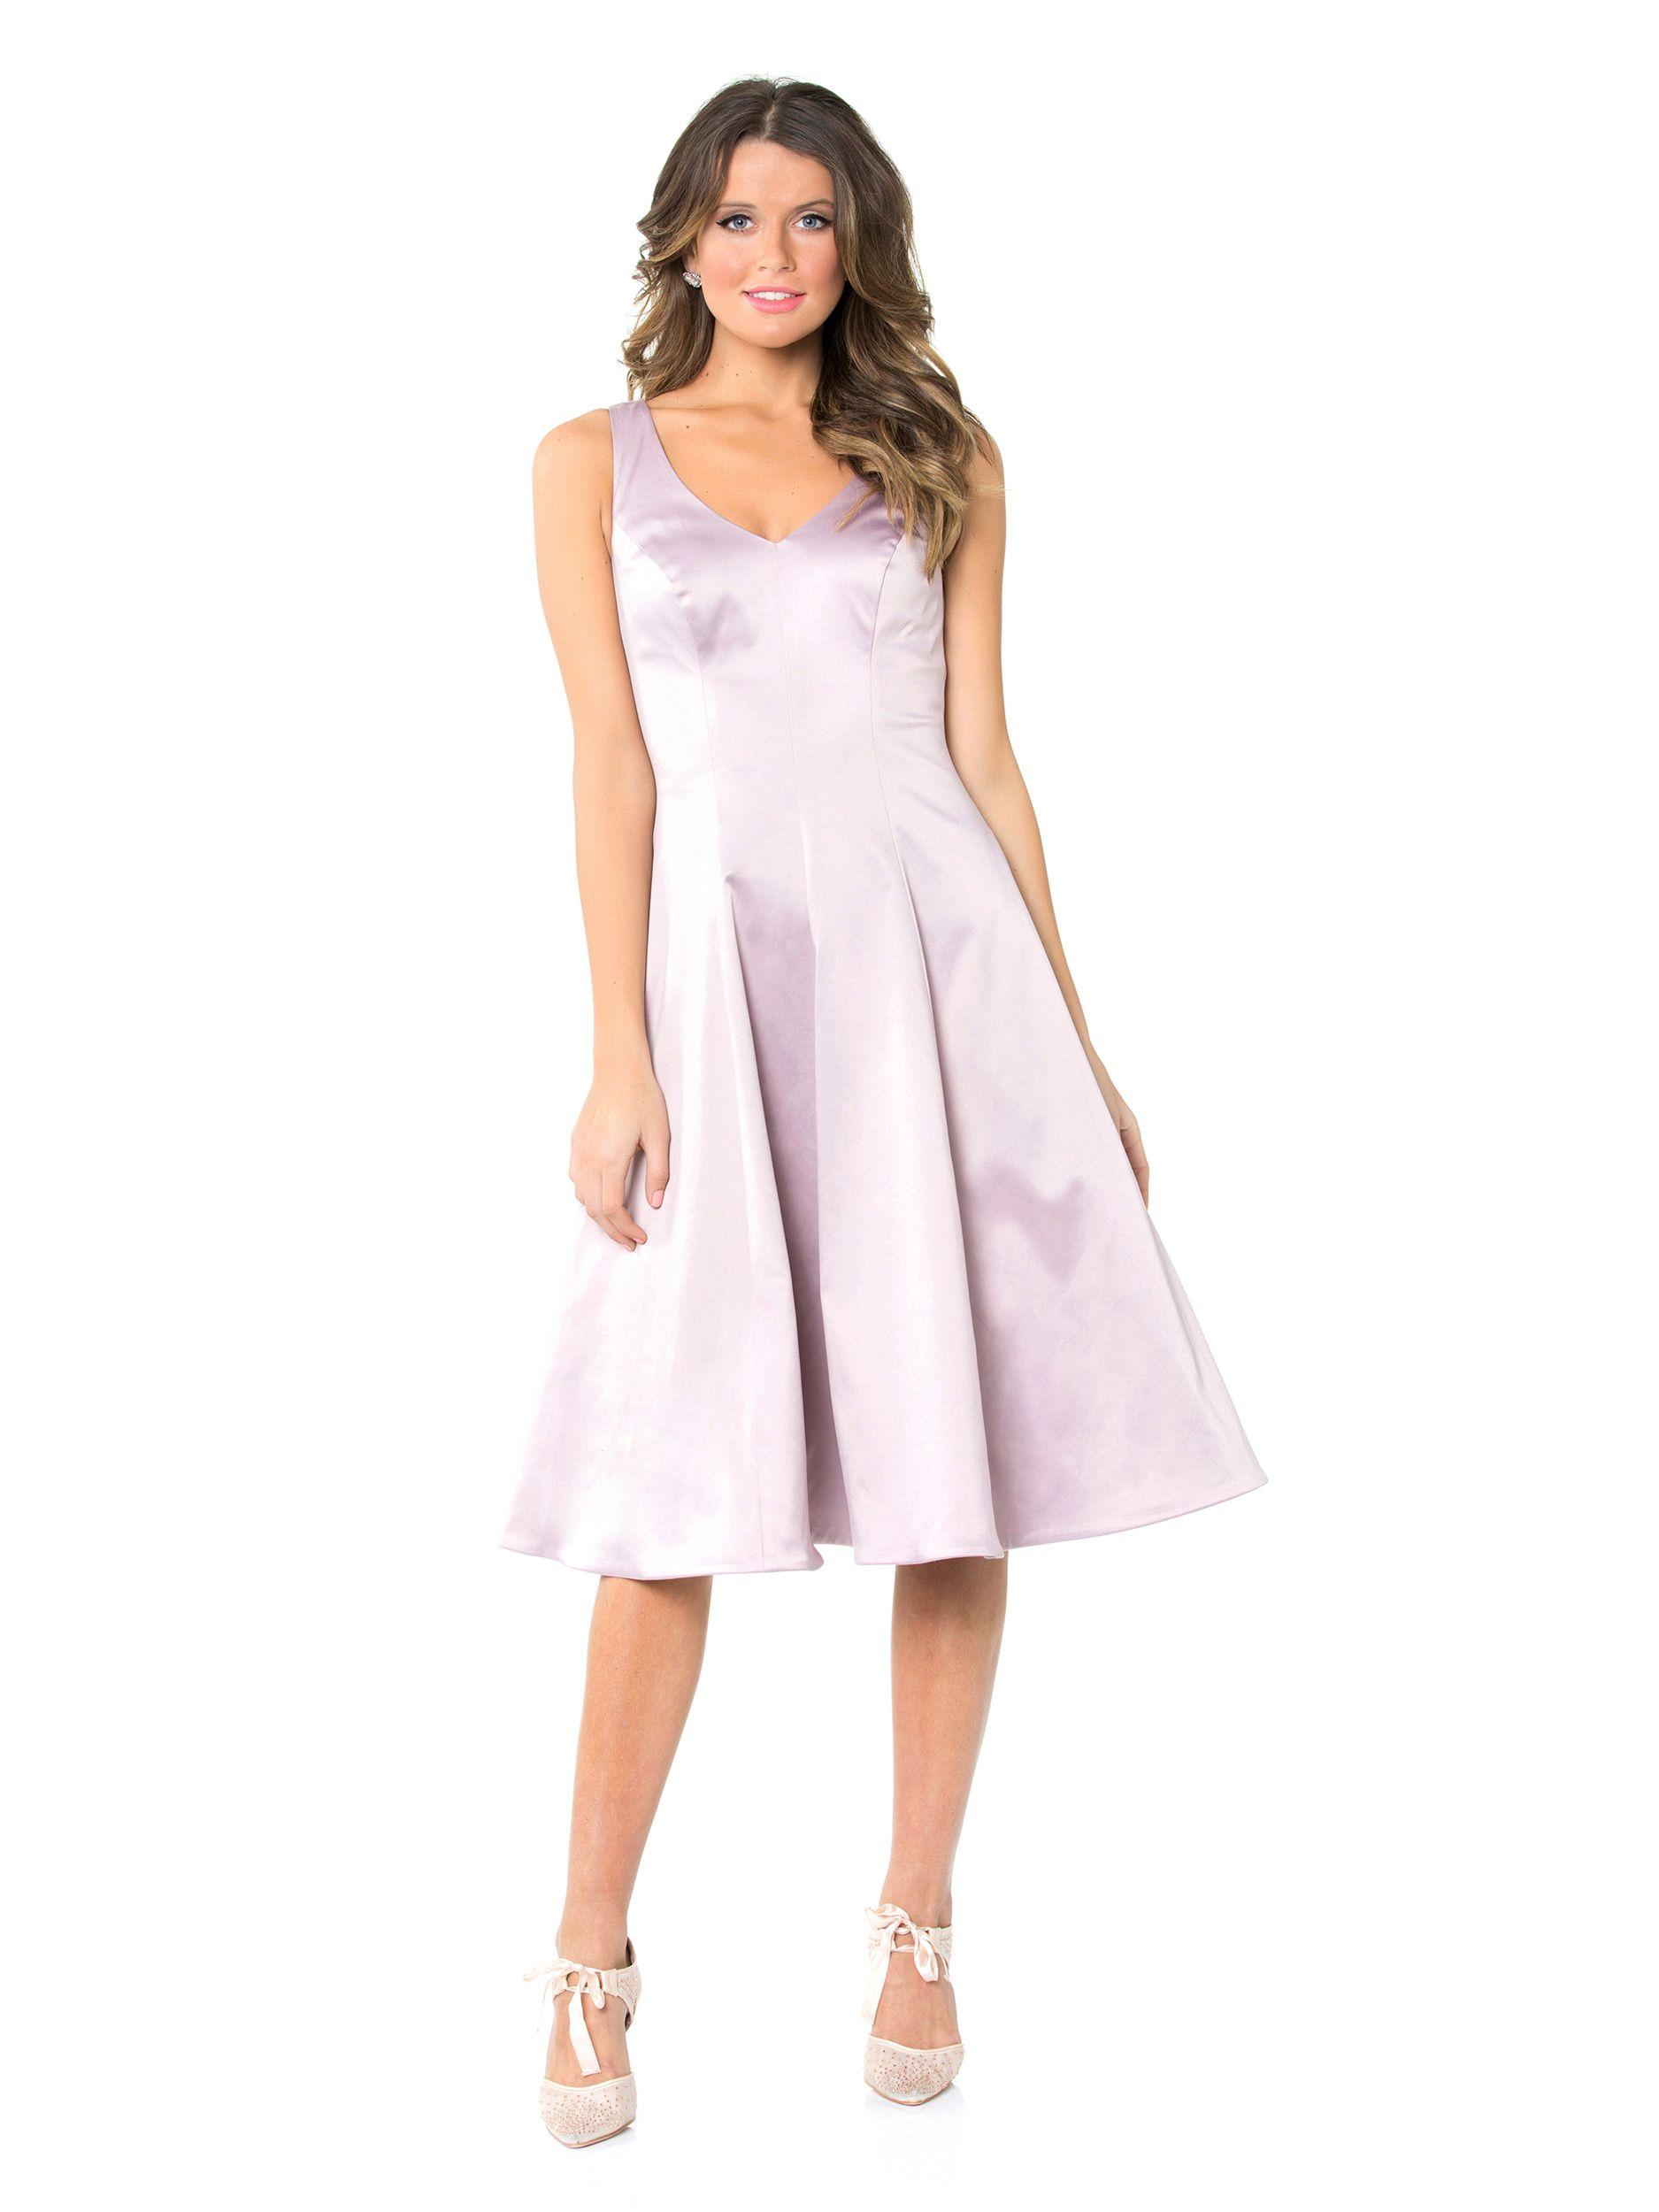 Atlantic dress dresses dress making ball gowns